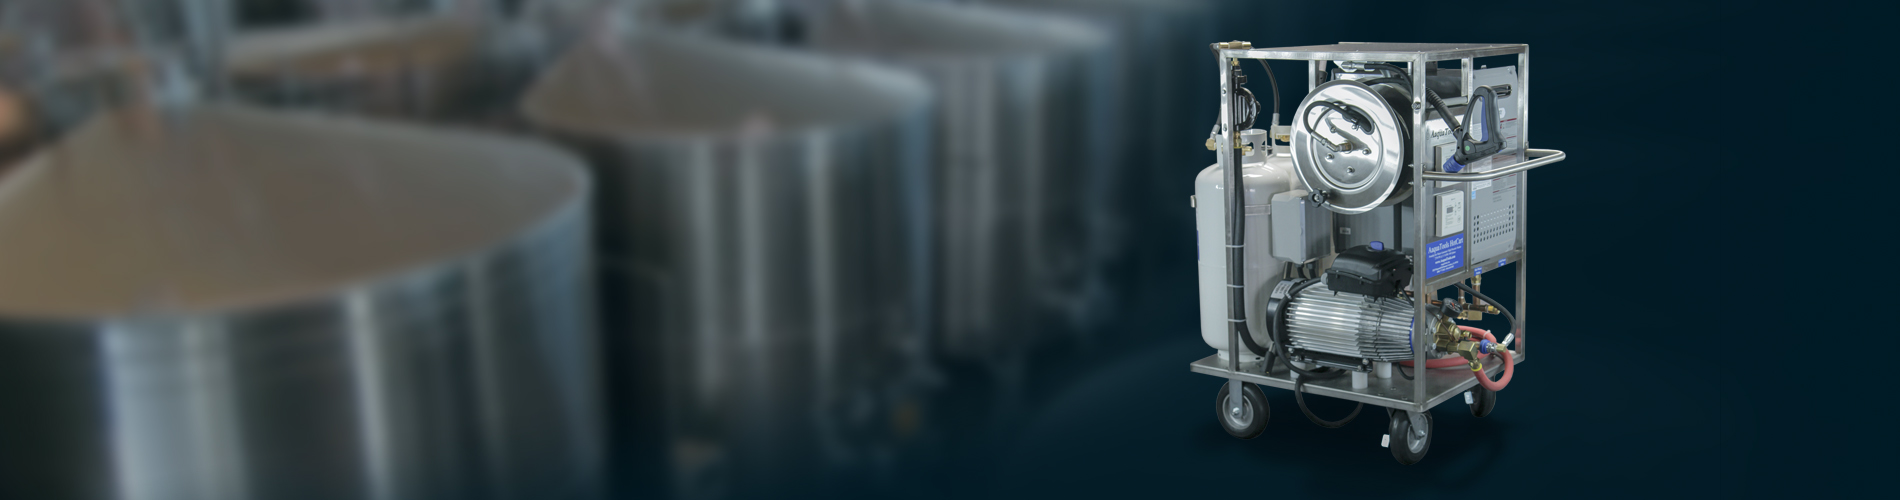 HotCart Adjustable Hot Pressure Washer